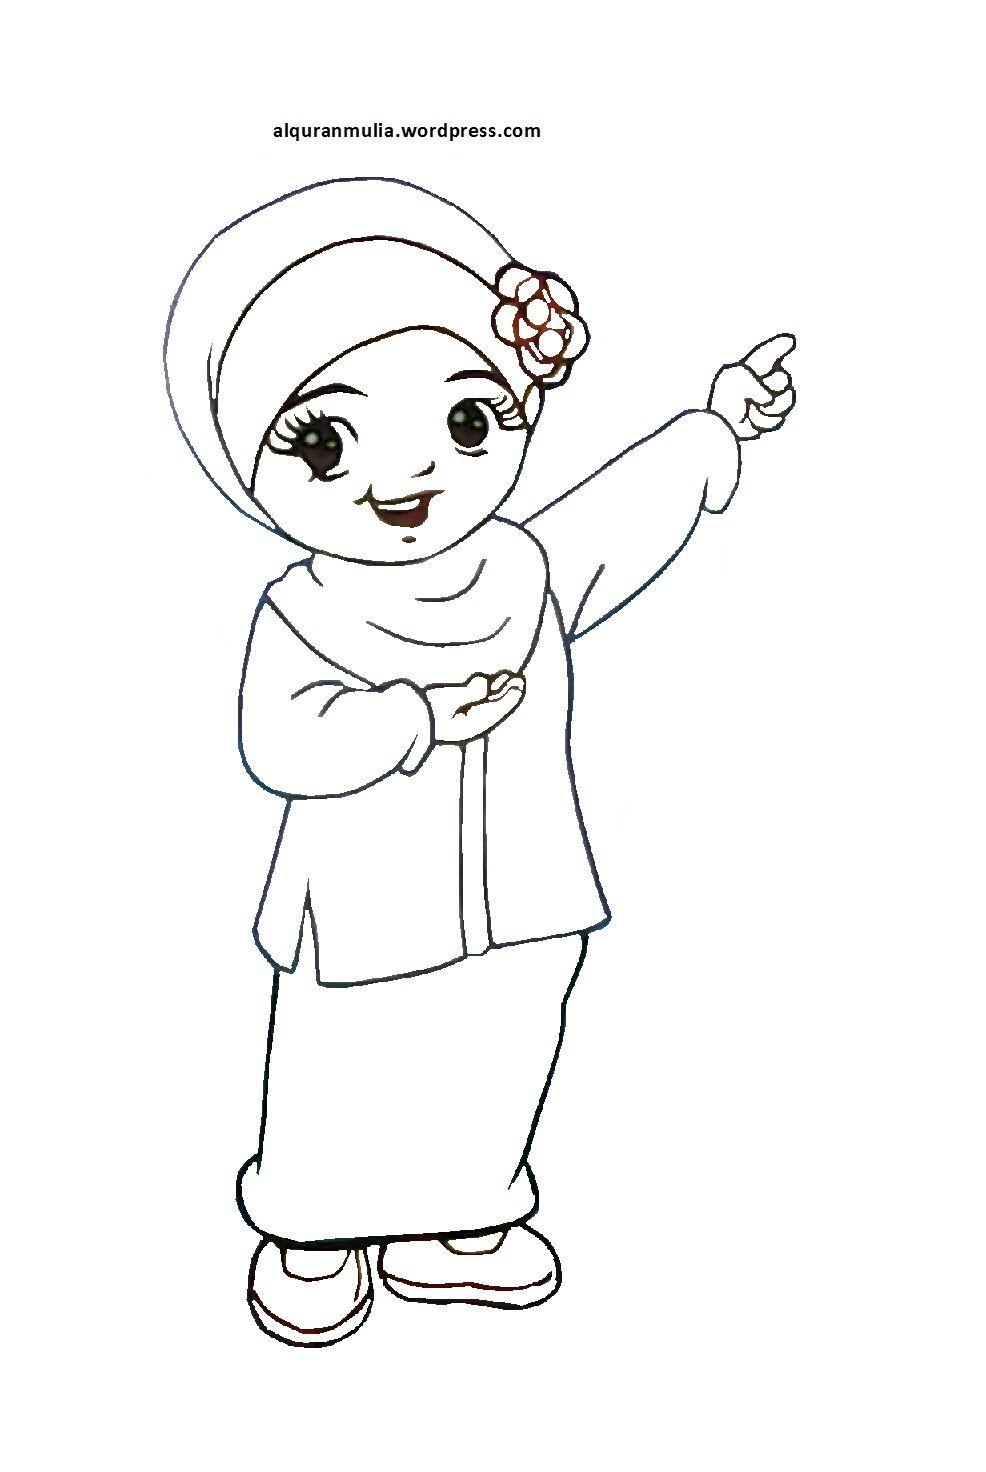 Ibu Muslimahpreneurkarawang Goruntuler Ile Cizim Kelebekler